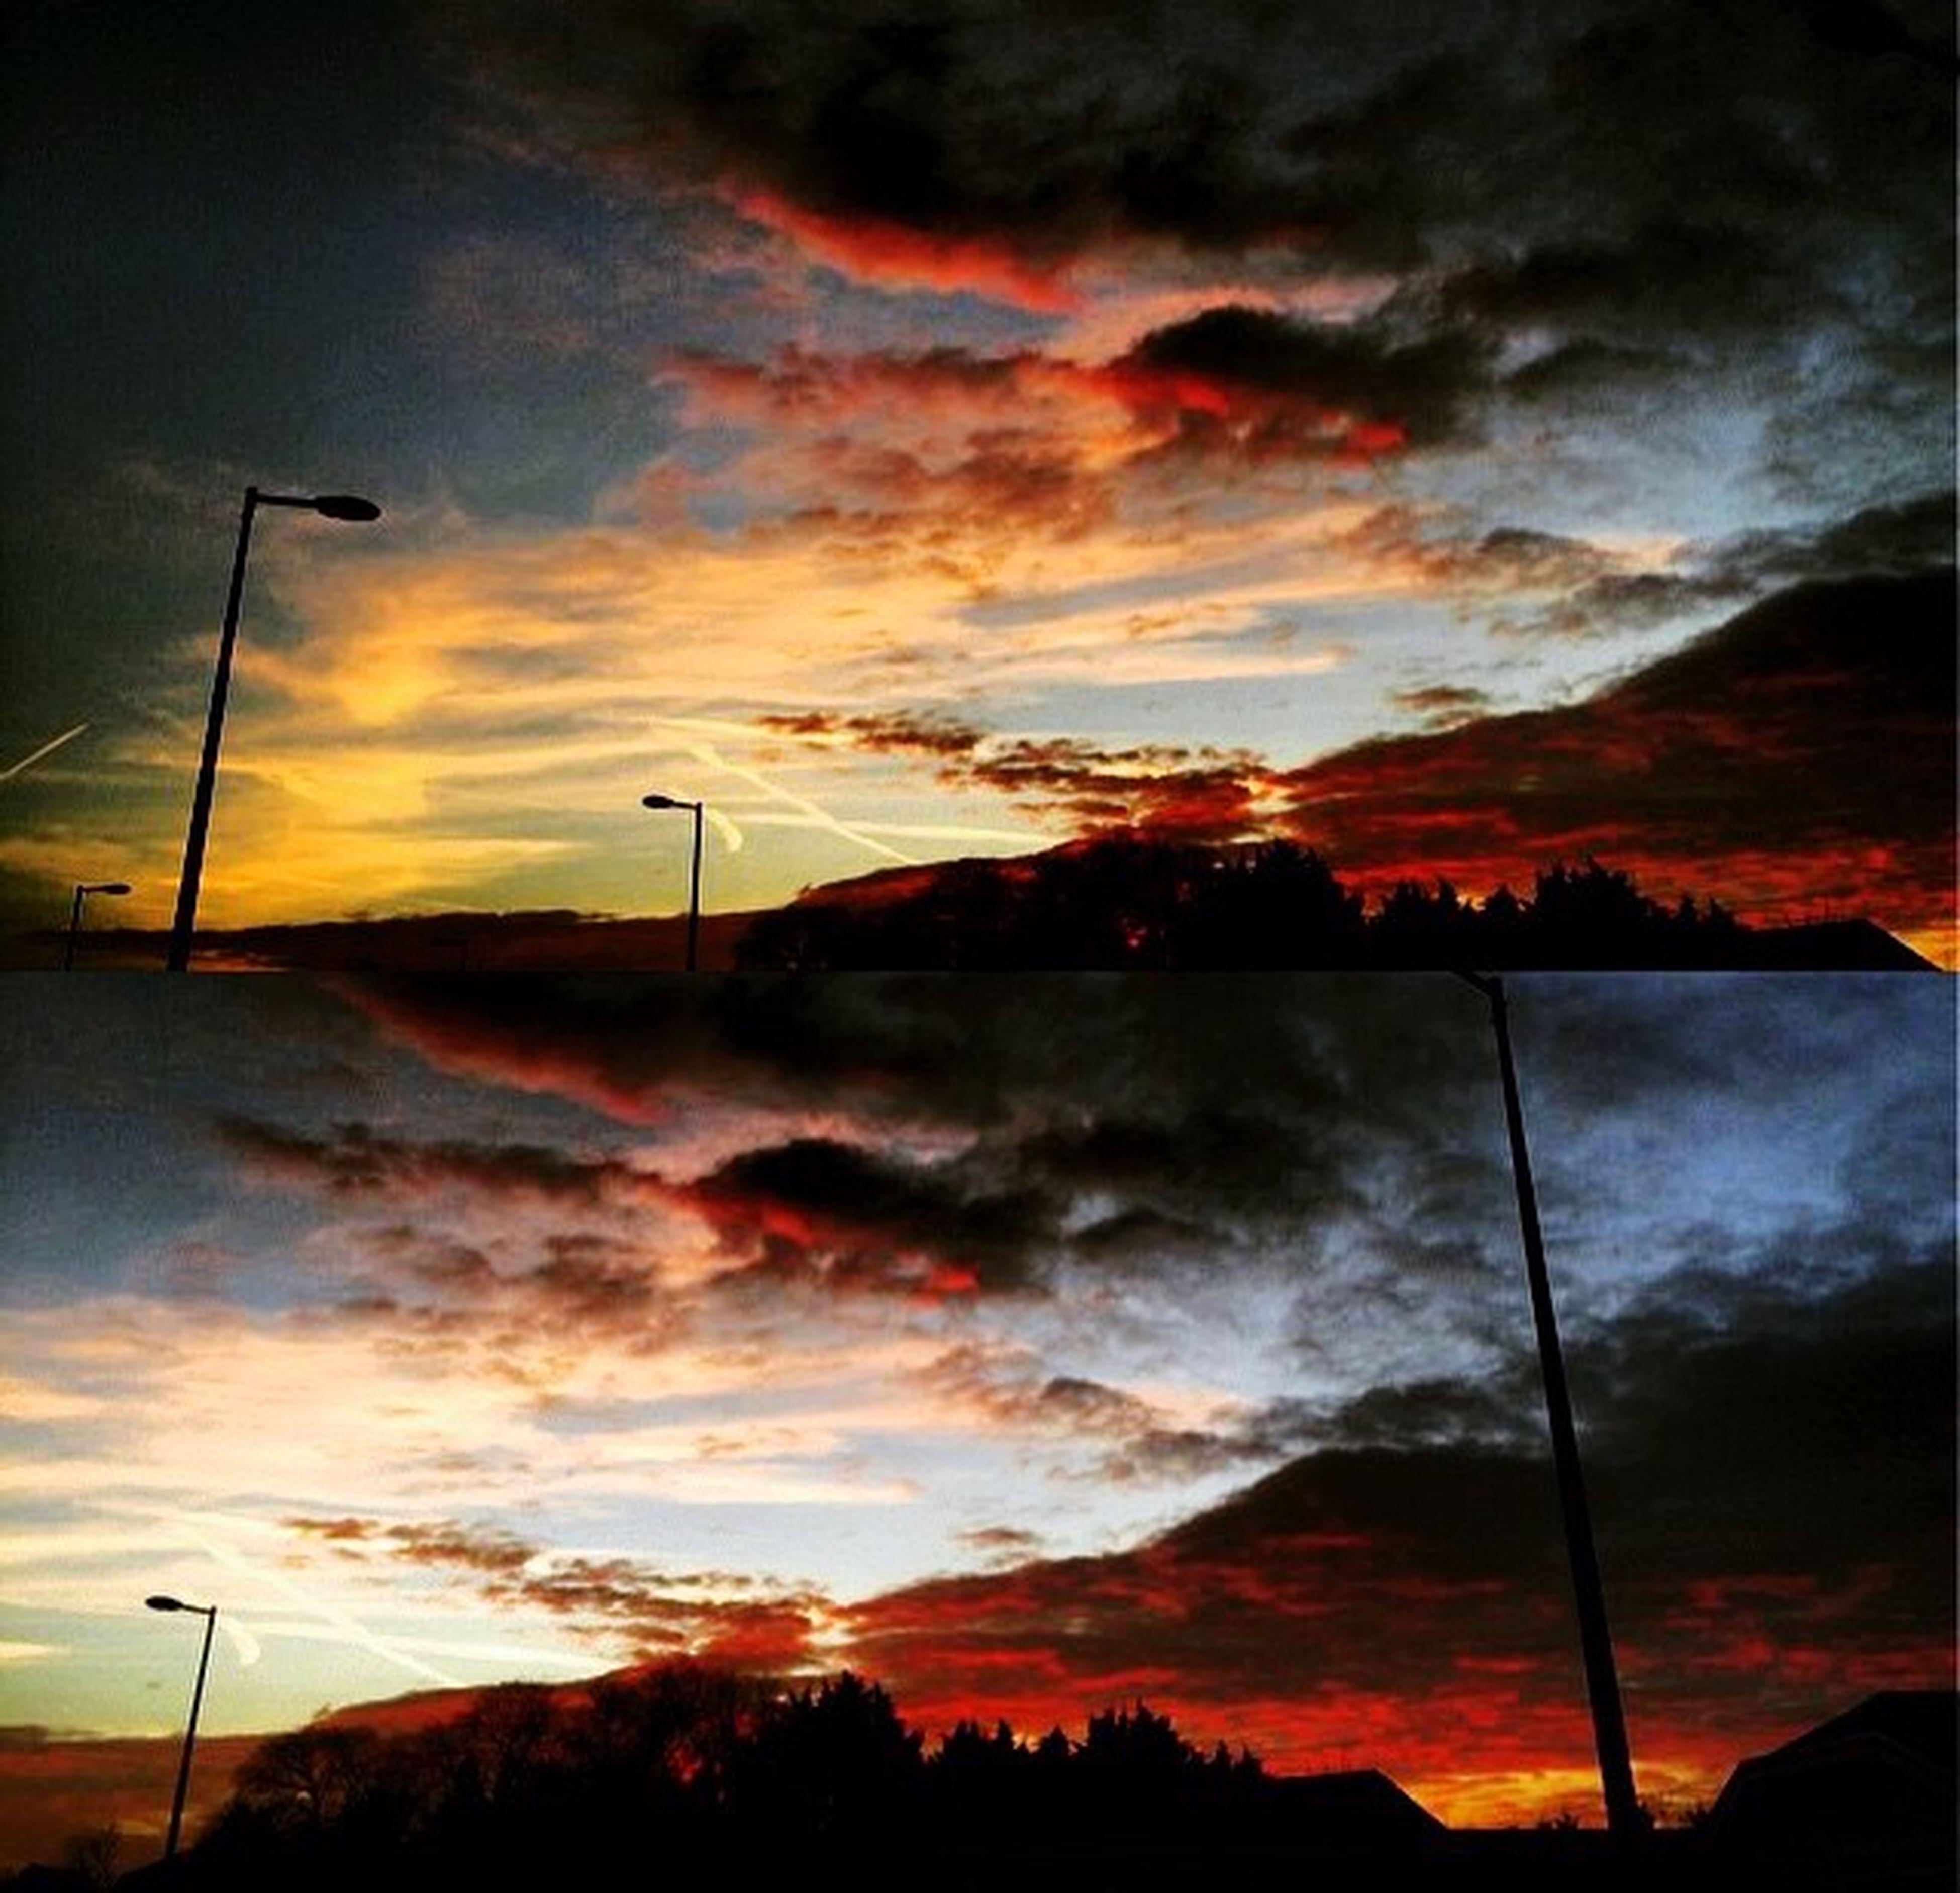 sunset, sky, orange color, cloud - sky, scenics, dramatic sky, beauty in nature, silhouette, tranquil scene, tranquility, cloudy, street light, electricity pylon, nature, weather, power line, landscape, idyllic, cloud, atmospheric mood